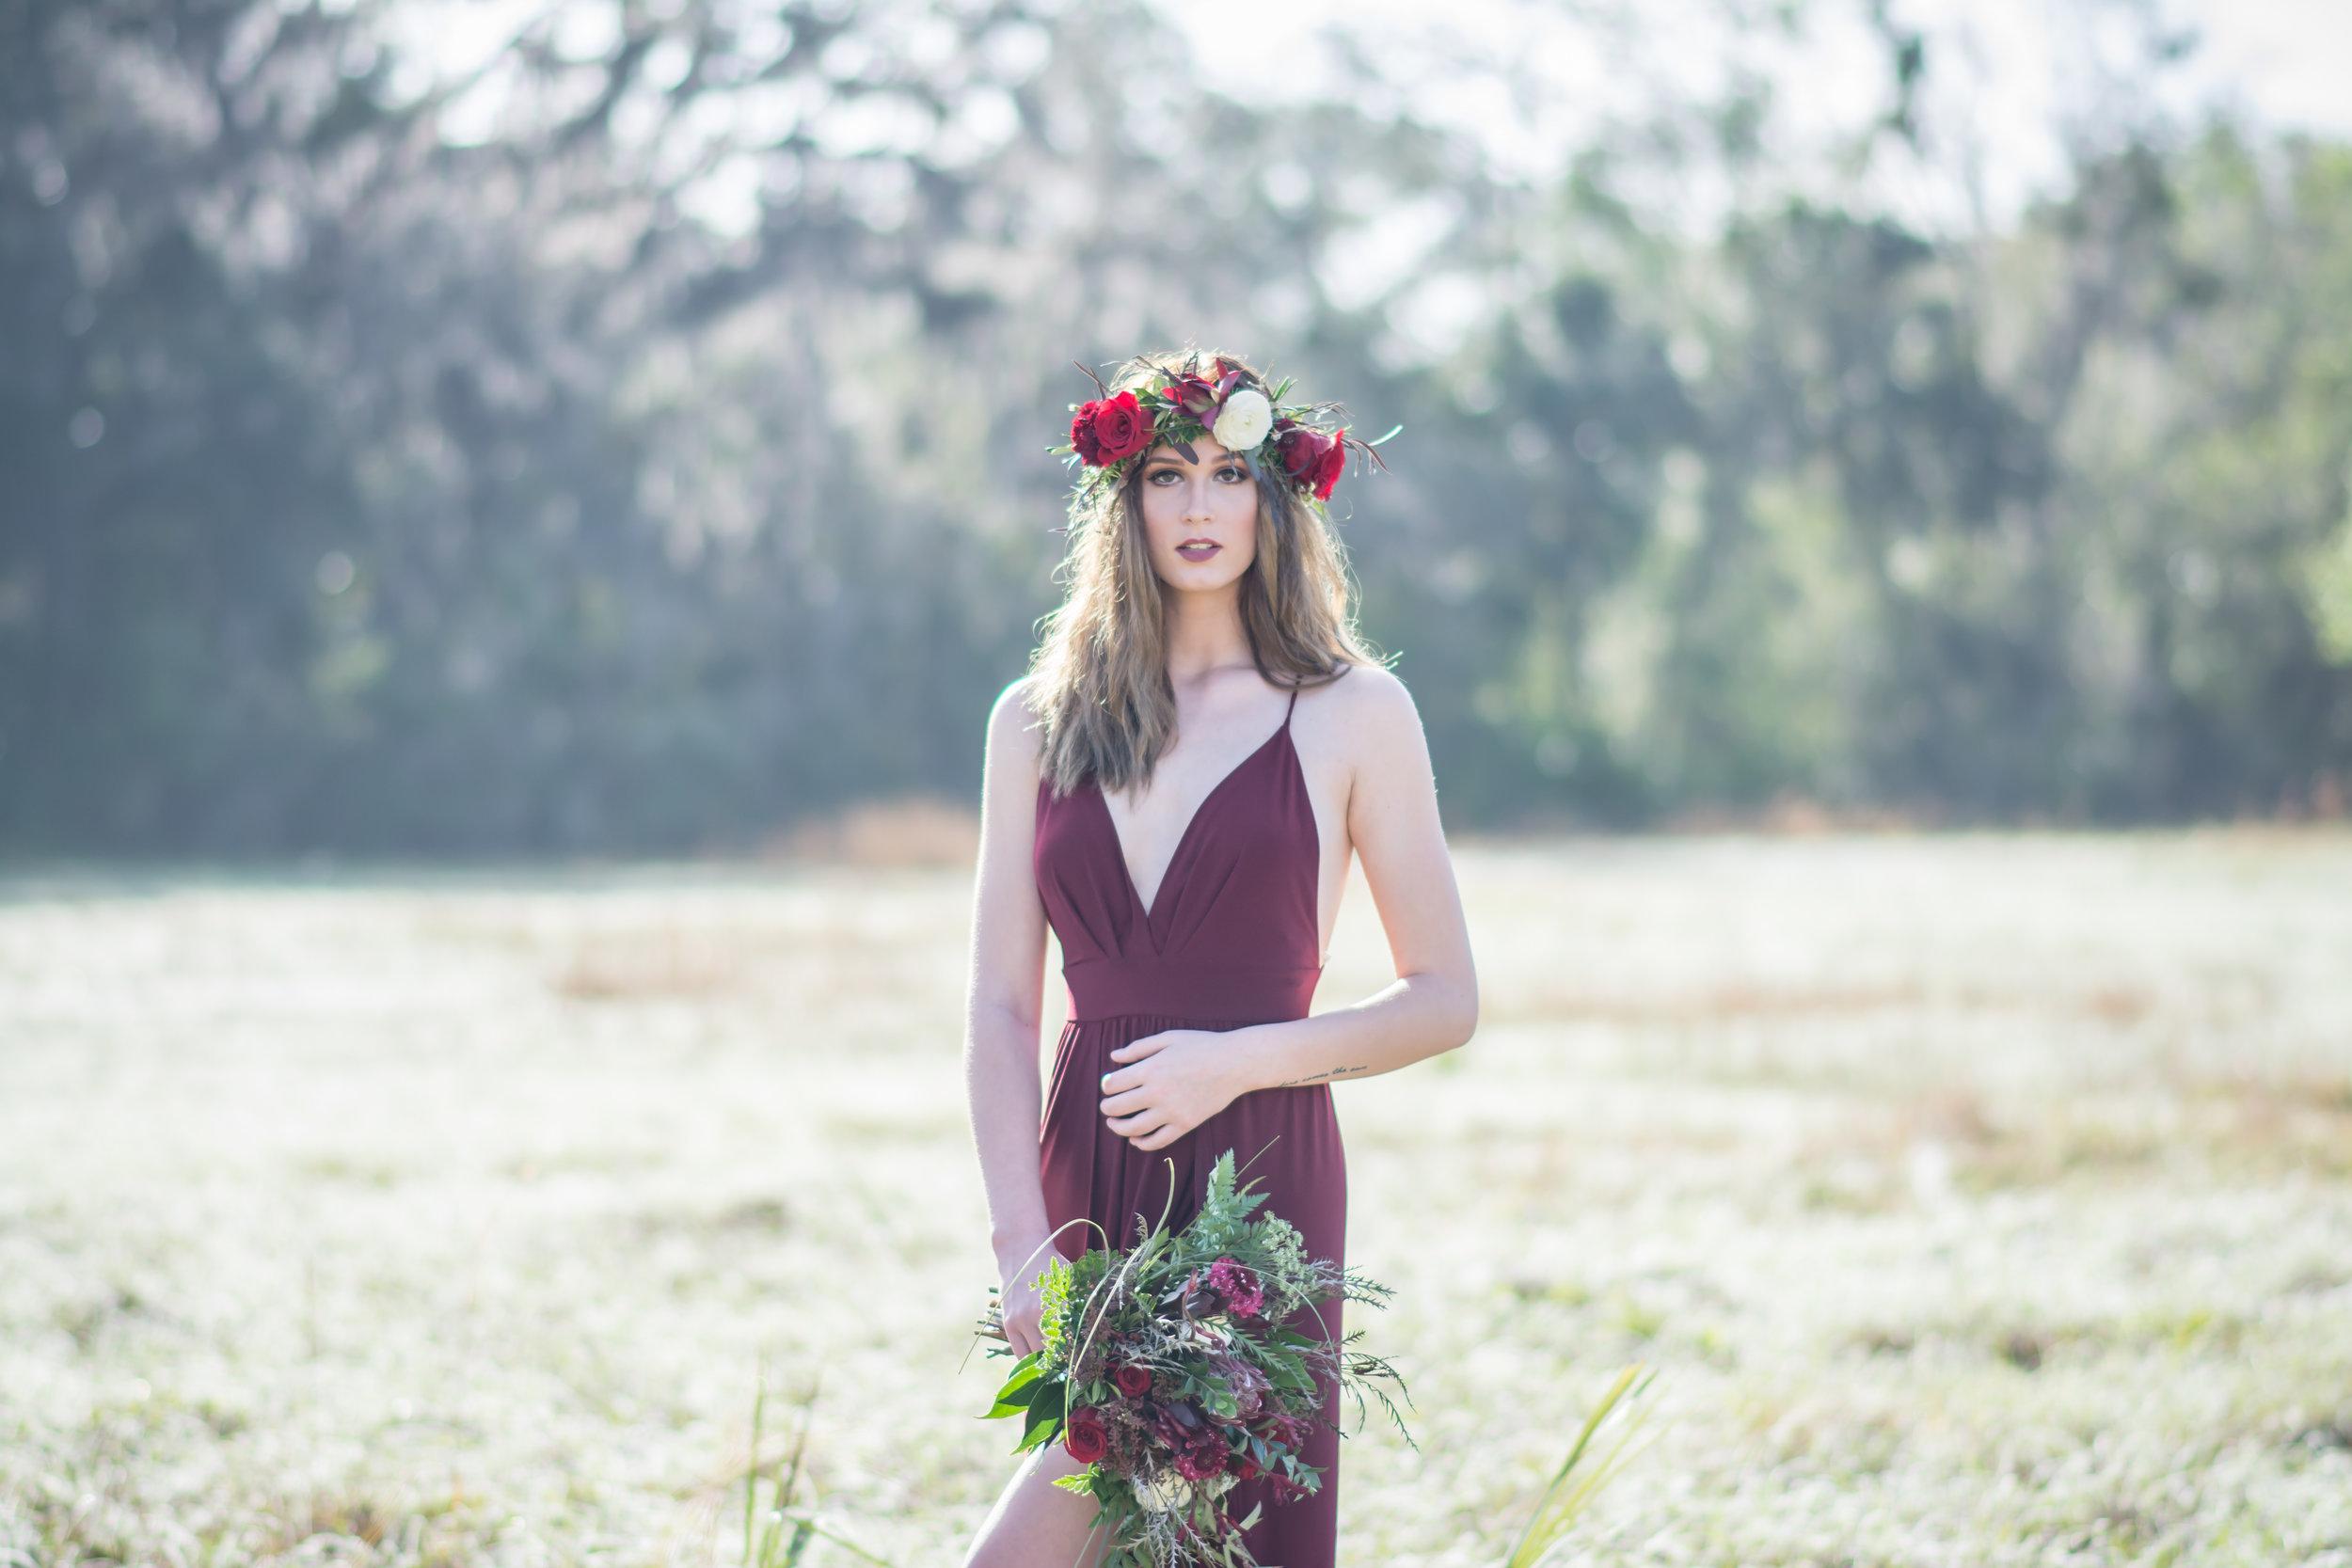 whimsical-bridal-inspiration-fashion-photoshoot-geneva-photographer-yanitza-ninett-44.jpg